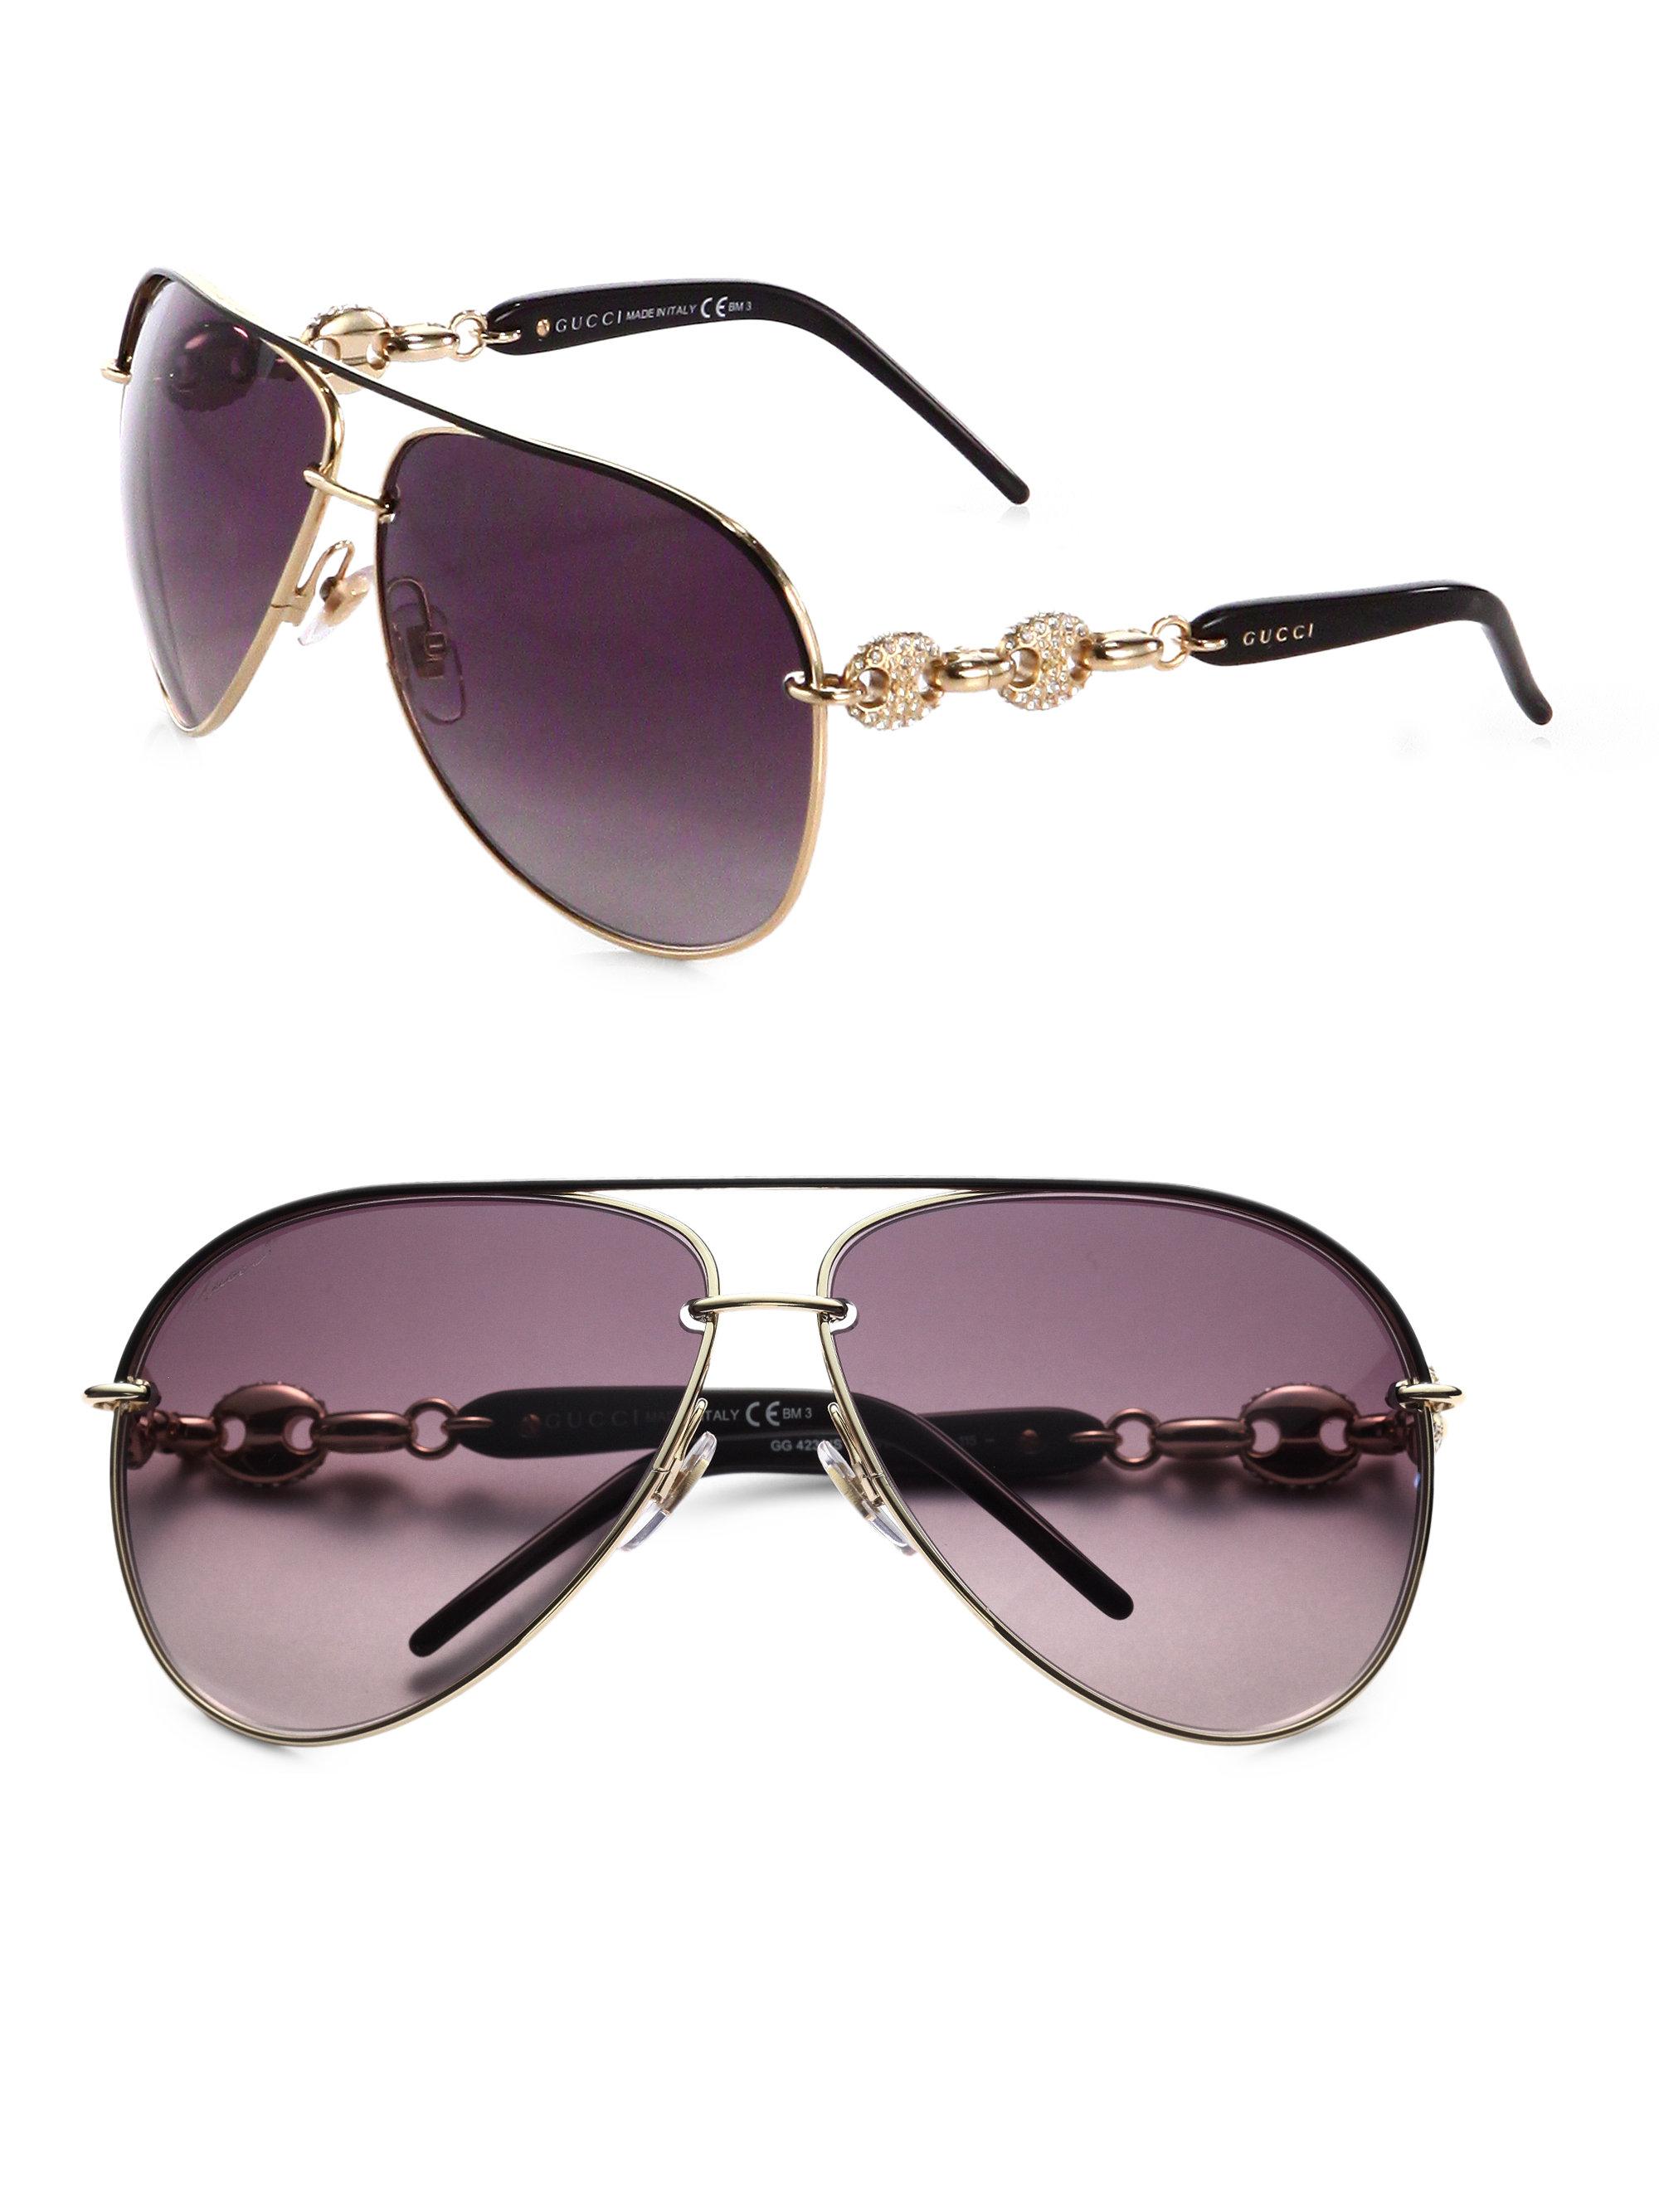 645735f2ab0 Lyst - Gucci Embellished Aviator Sunglasses in Metallic